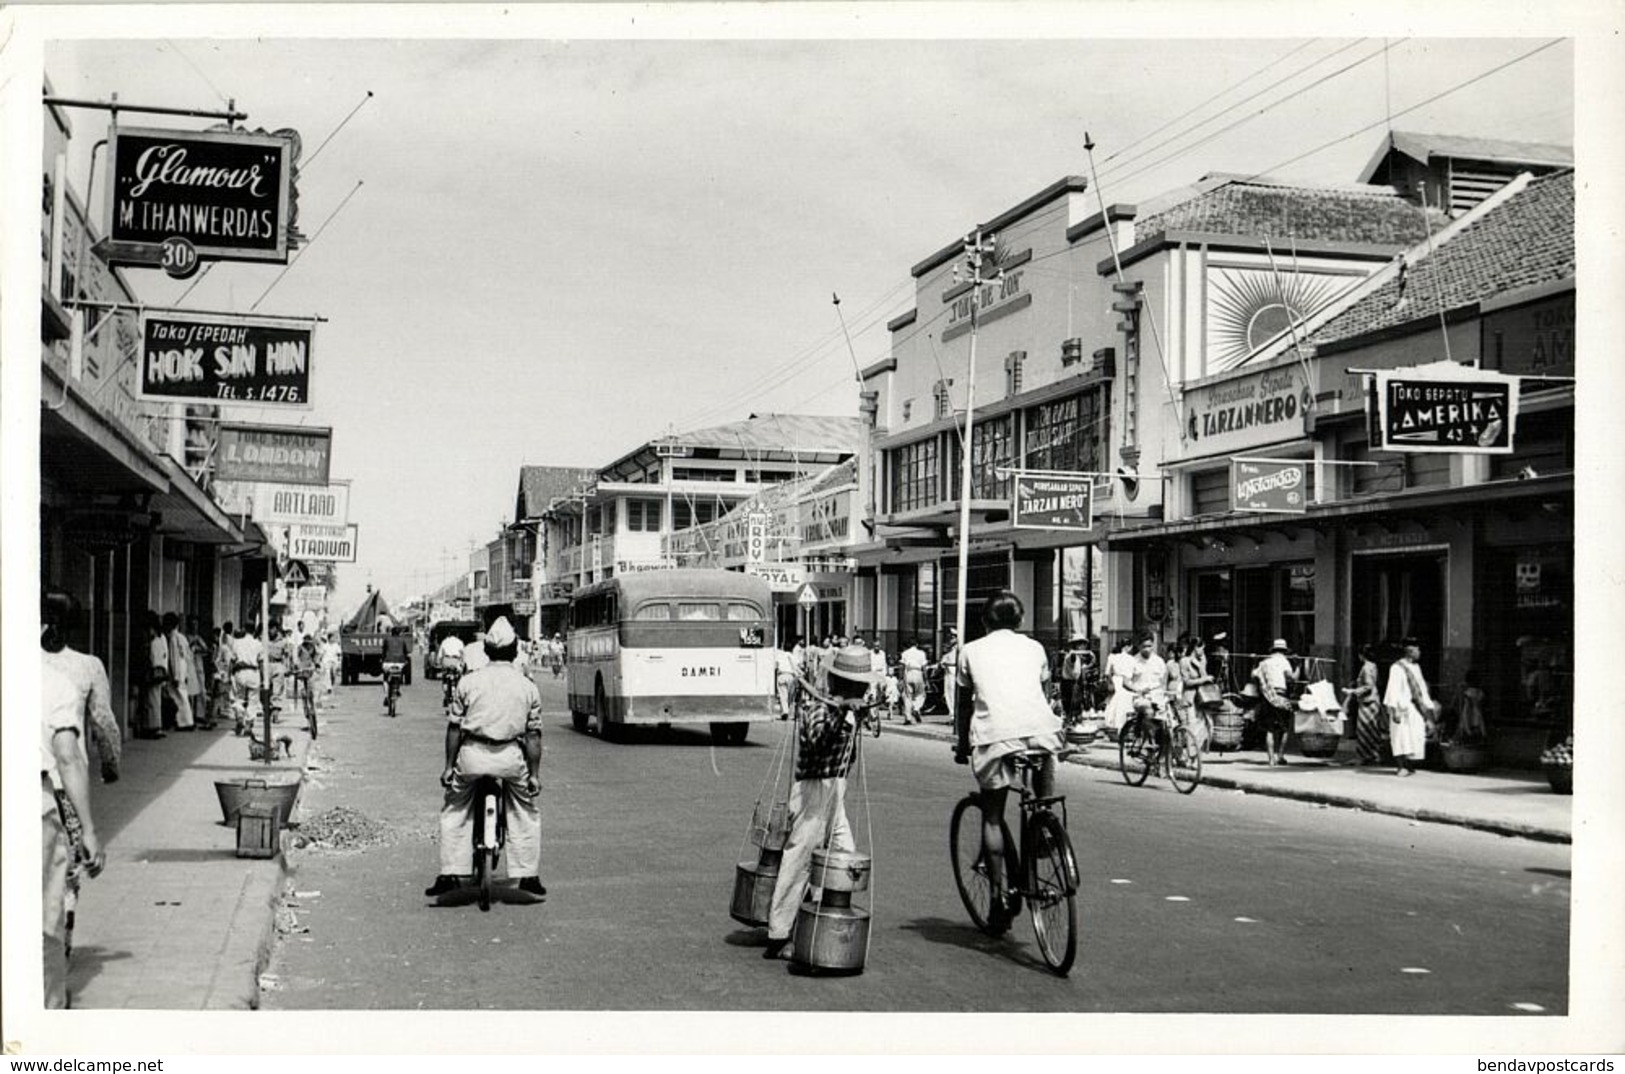 Indonesia, JAVA BANDUNG, Djl. Raja Barat, Toko De Zon, Bus, Bike (1950s) RPPC - Indonesië